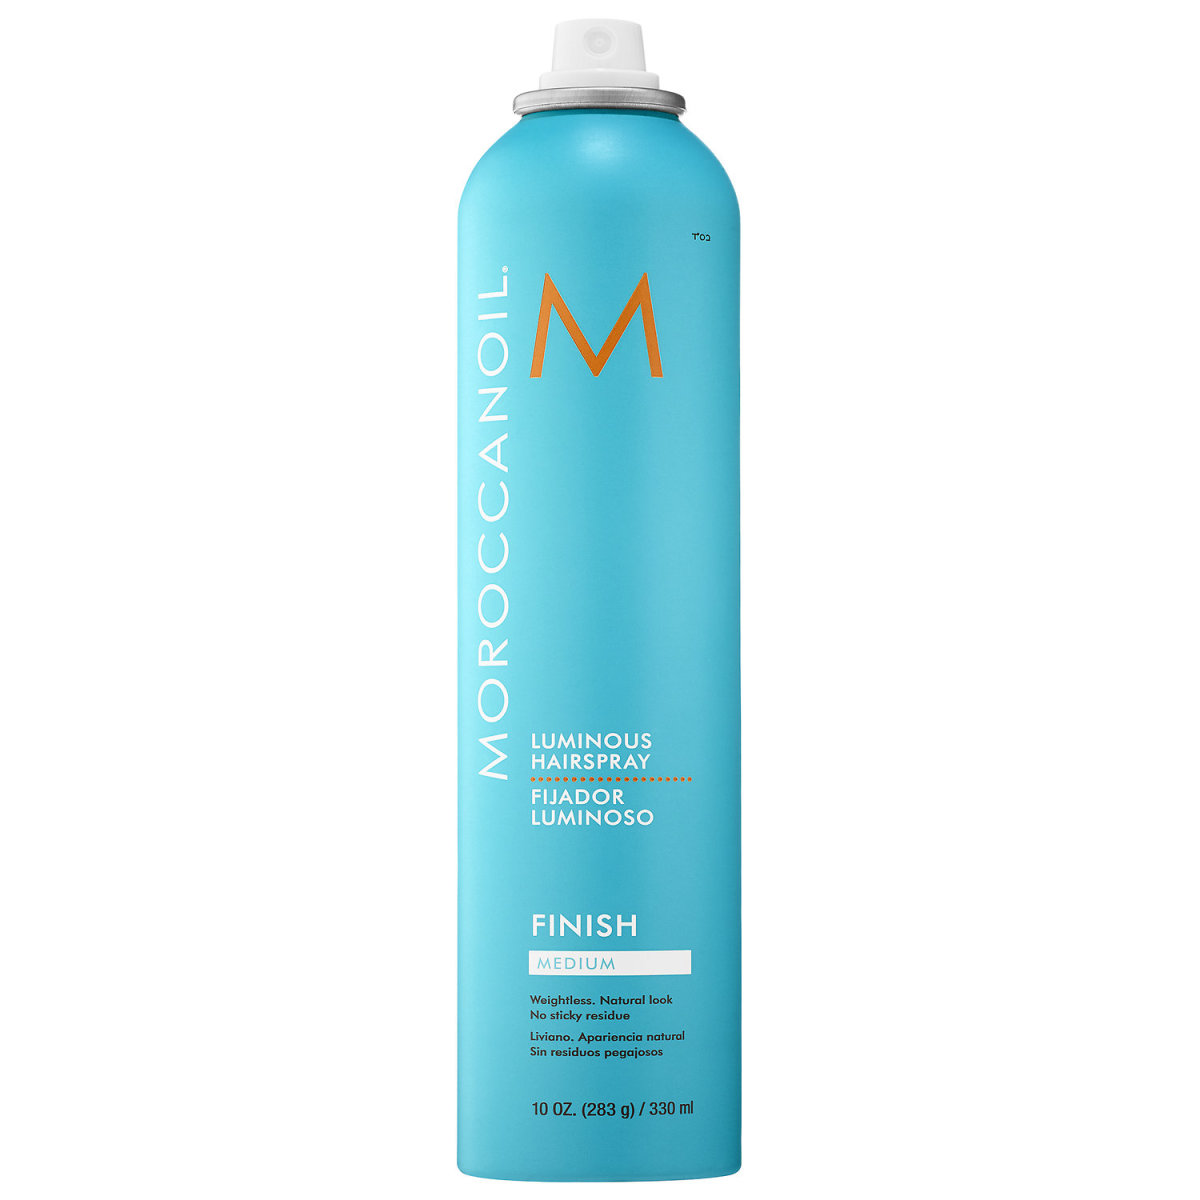 Moroccanoil Luminous Hairspray Medium Finish, $24, available here.